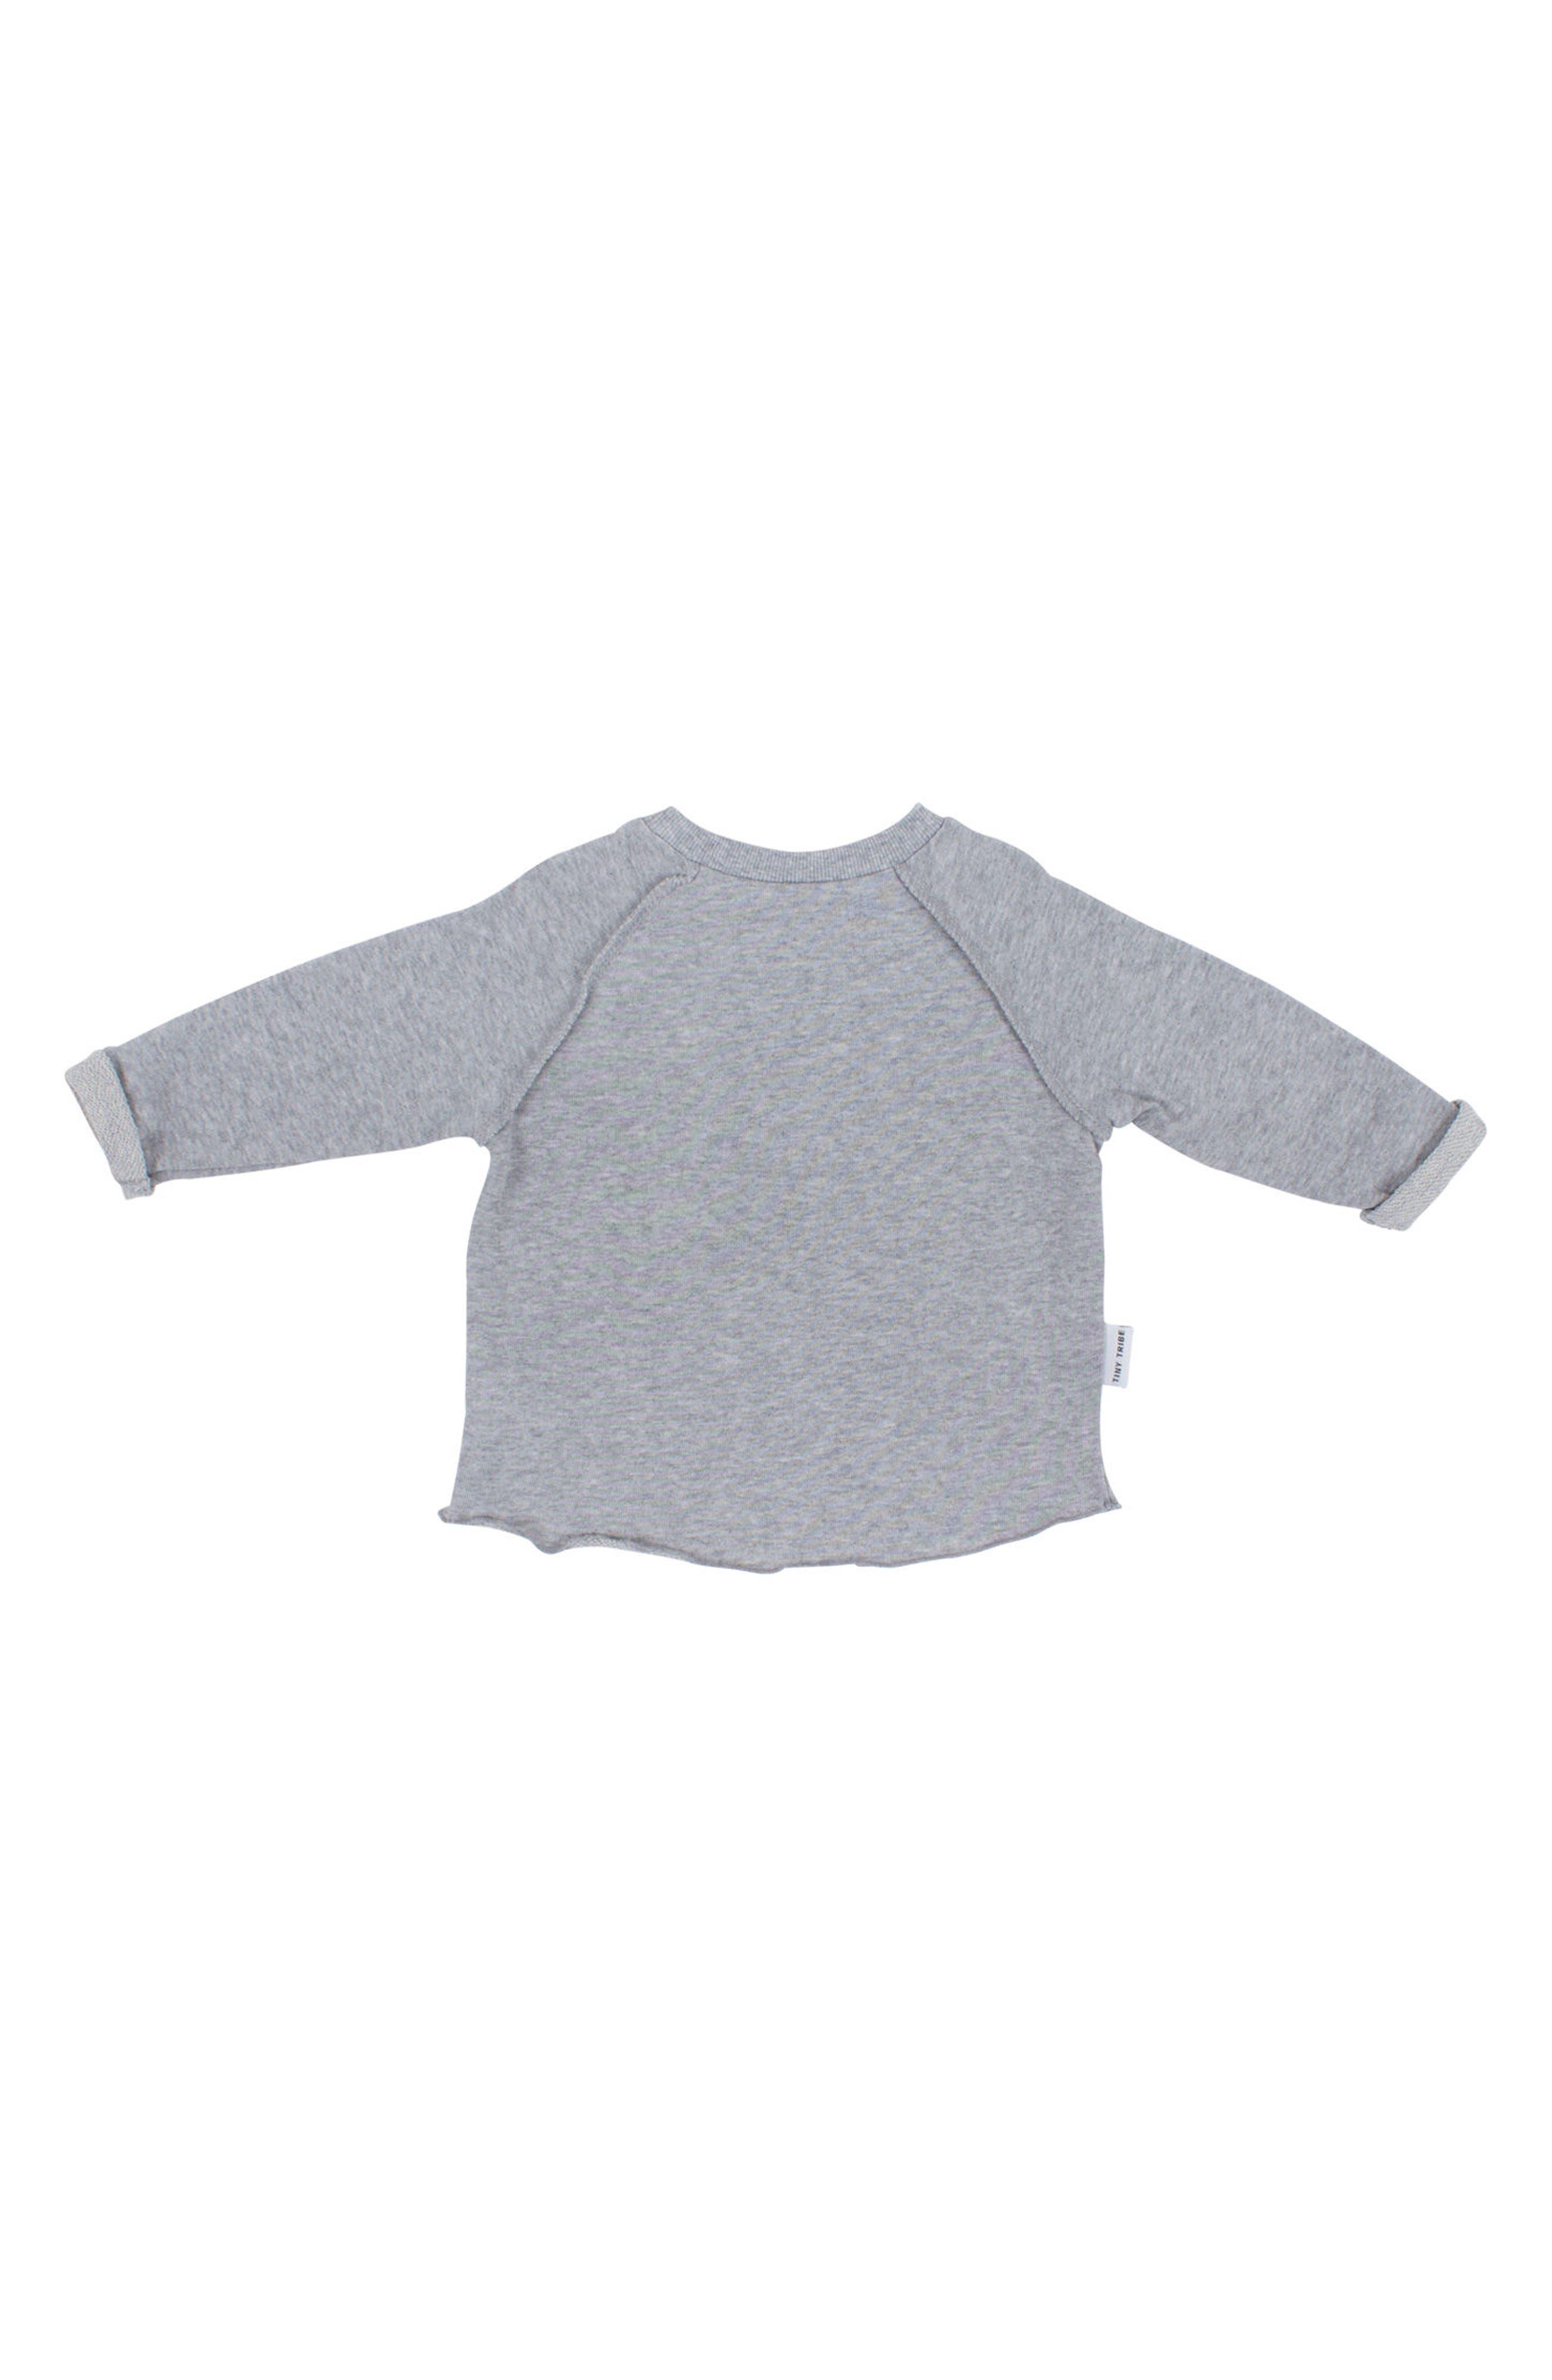 Panda Sweatshirt & Leggings Set,                             Alternate thumbnail 3, color,                             099